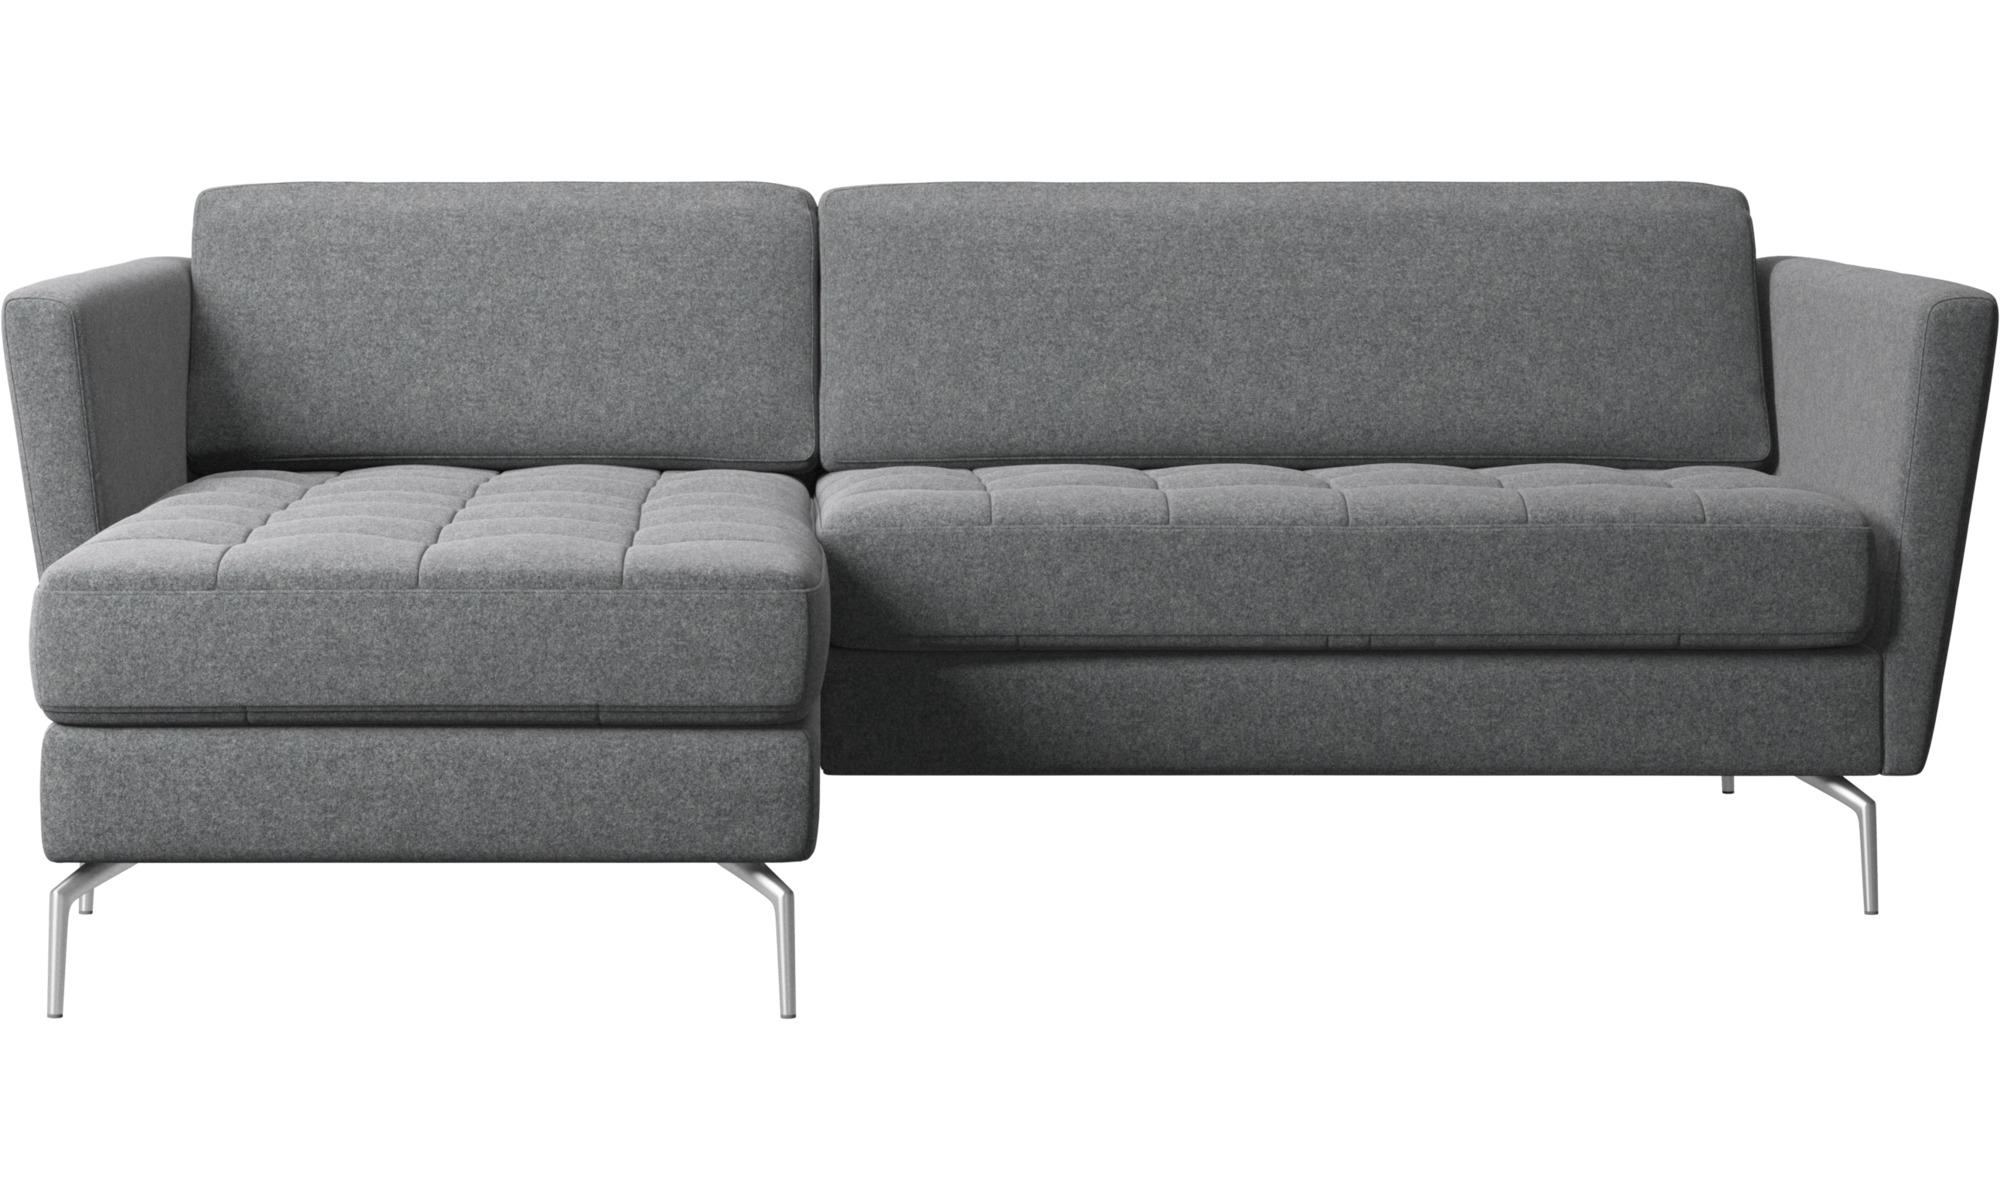 - Chaise Longue Sofas - Osaka Sofa With Resting Unit, Tufted Seat - BoConcept